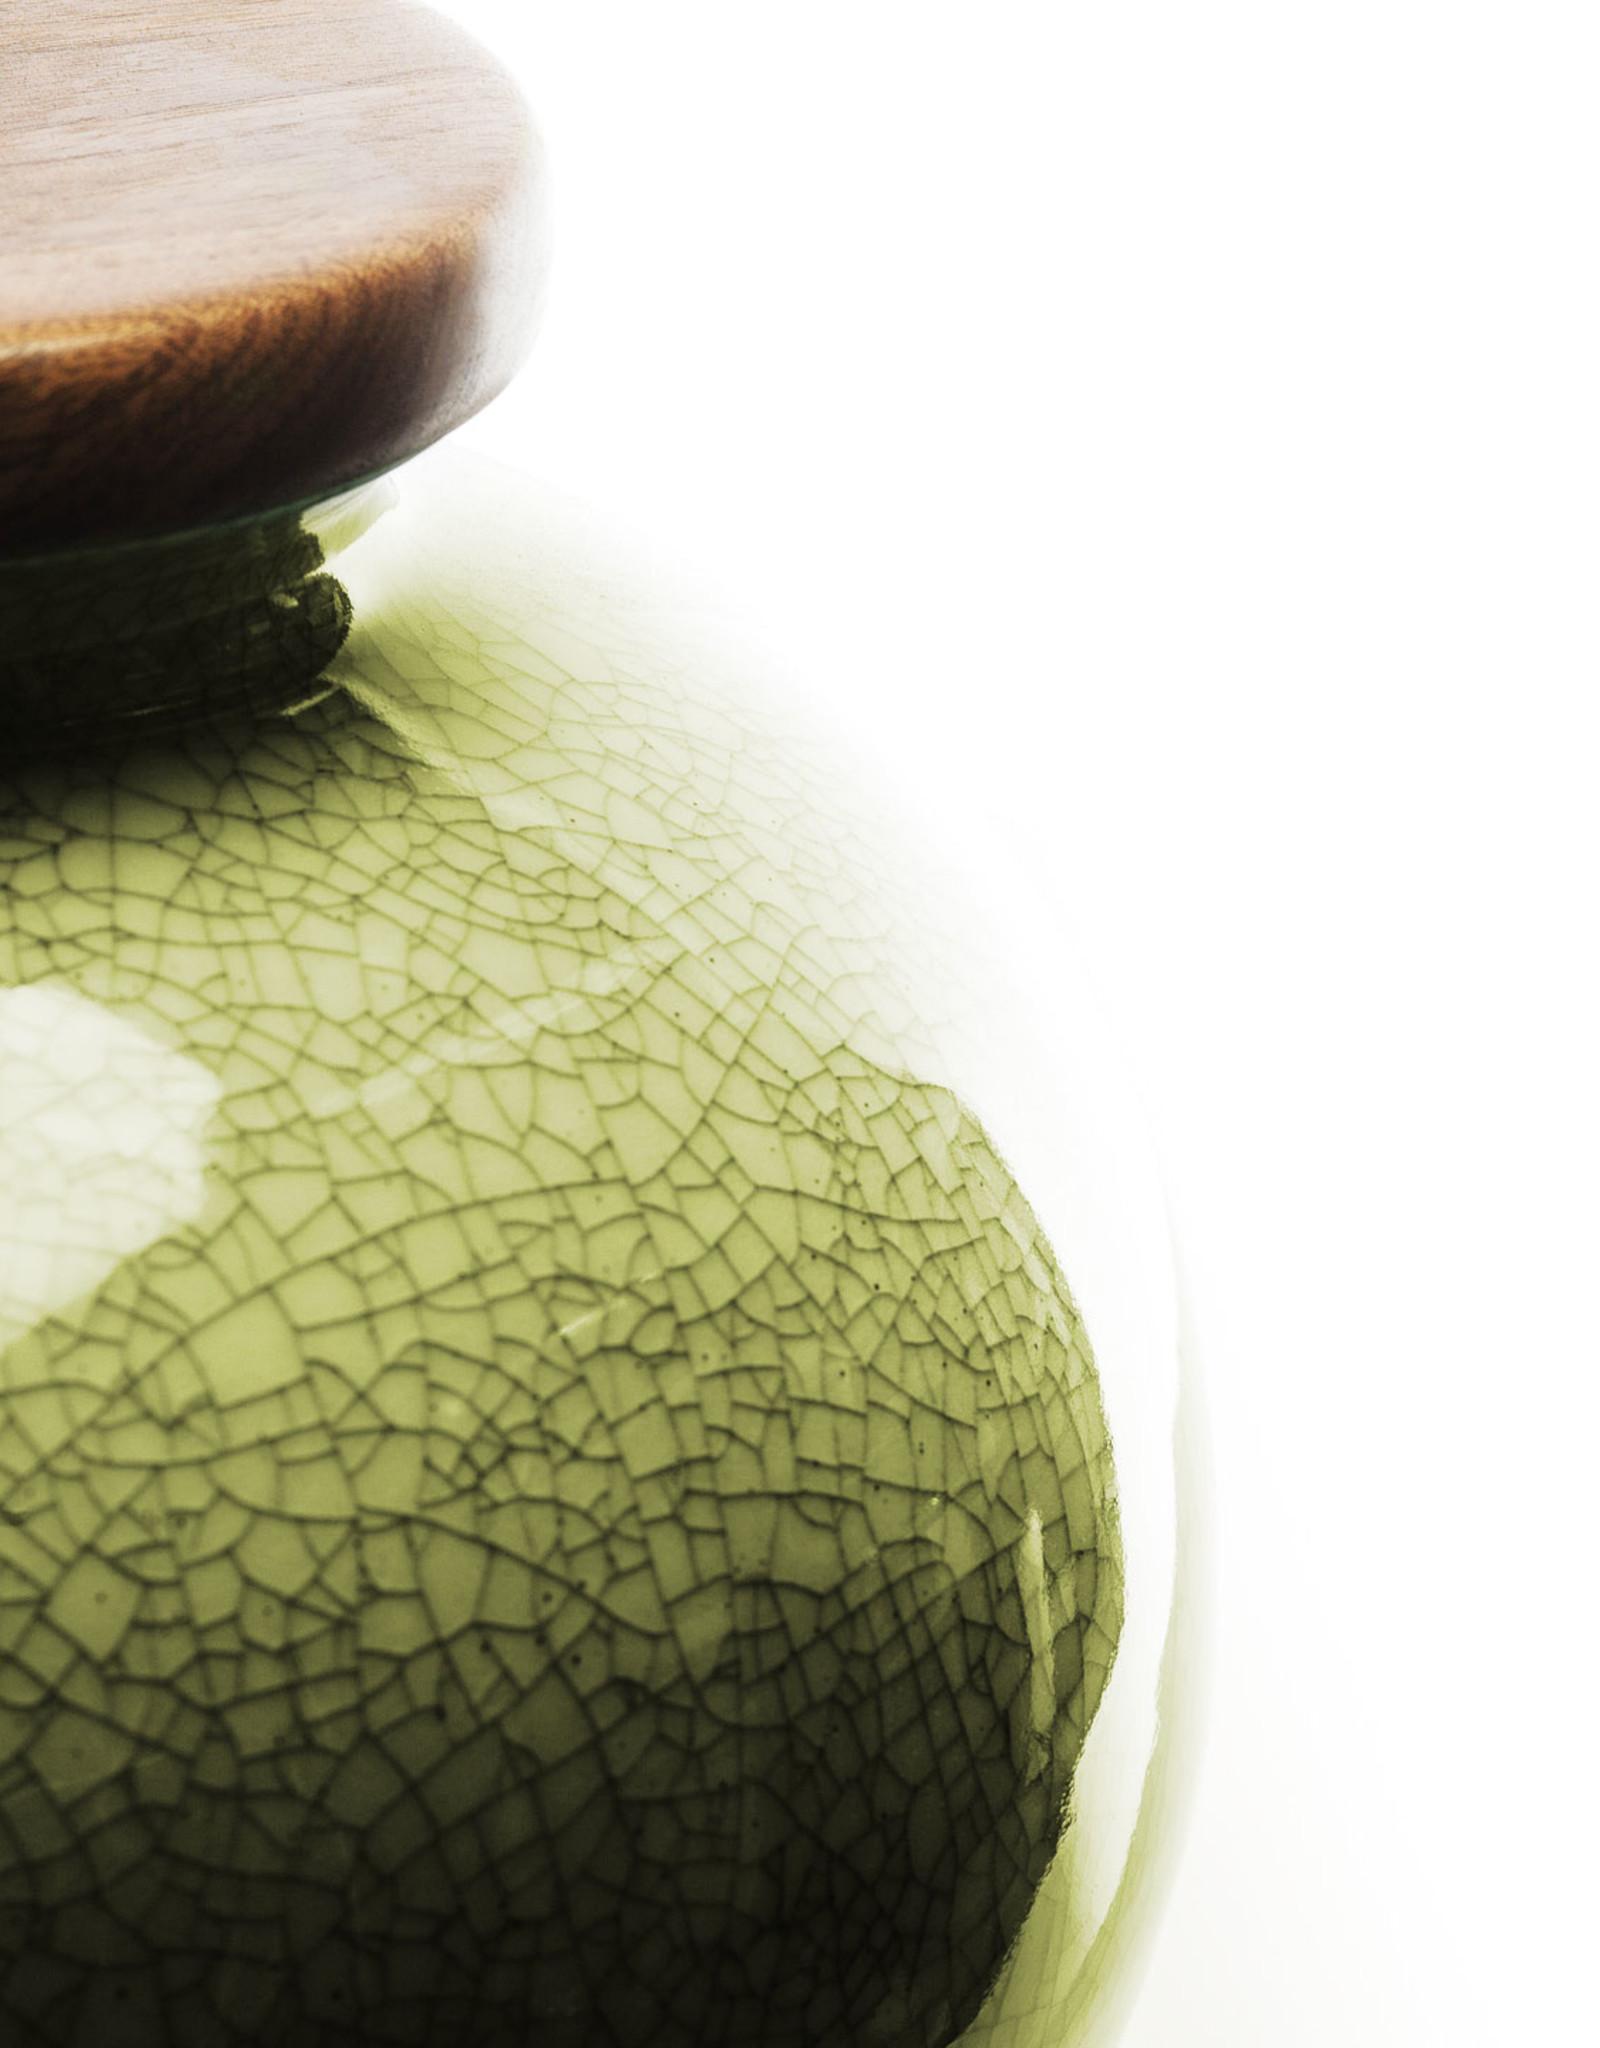 Lawrence & Scott Luca Porcelain Lamp in Celadon Crackle with Walnut Base